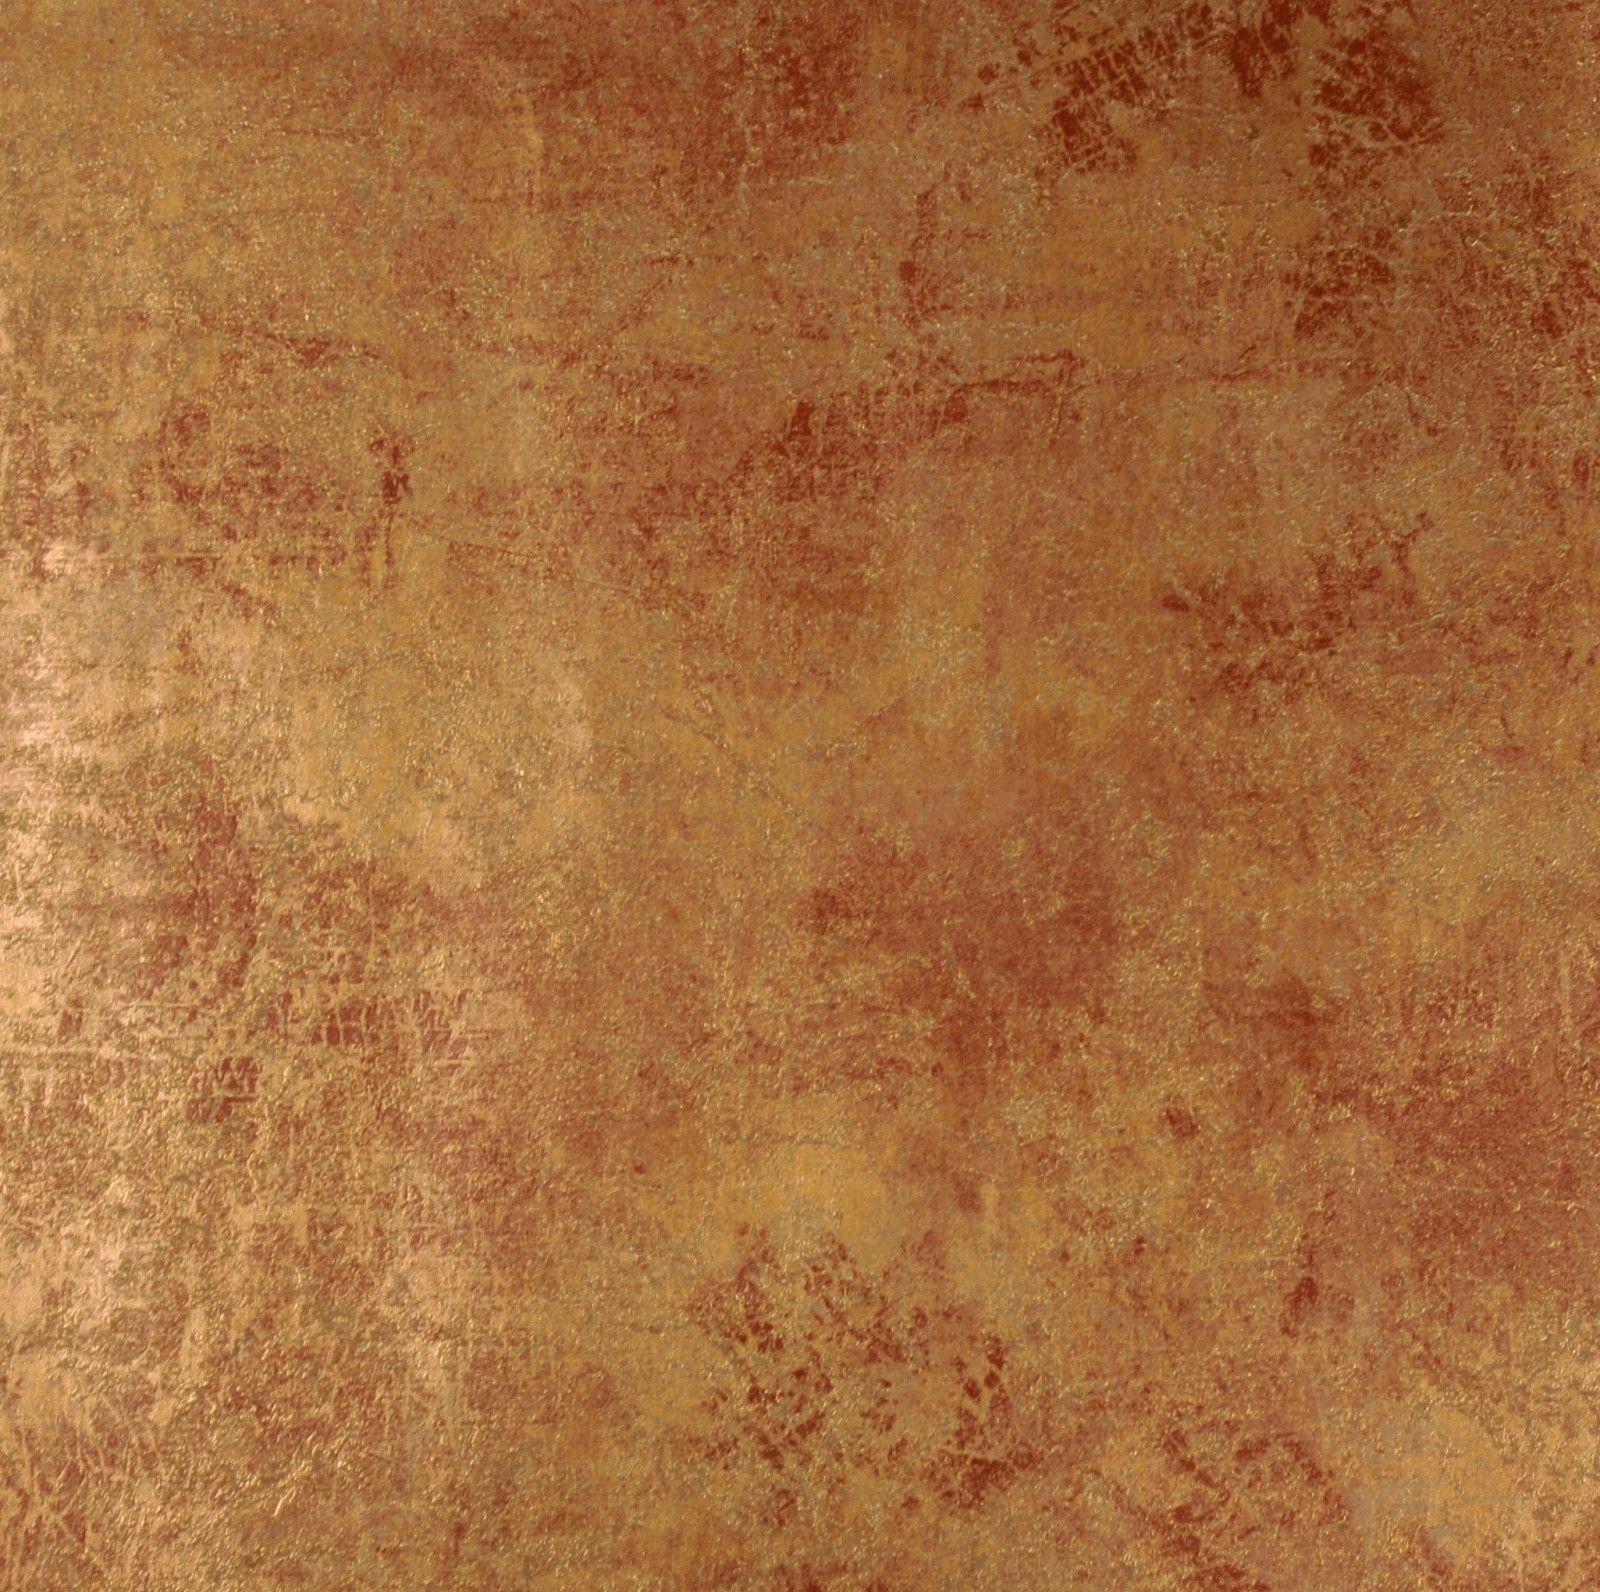 Tapeten Mediterran la veneziana vliestapete marburg tapete edel patina gold rost 77706